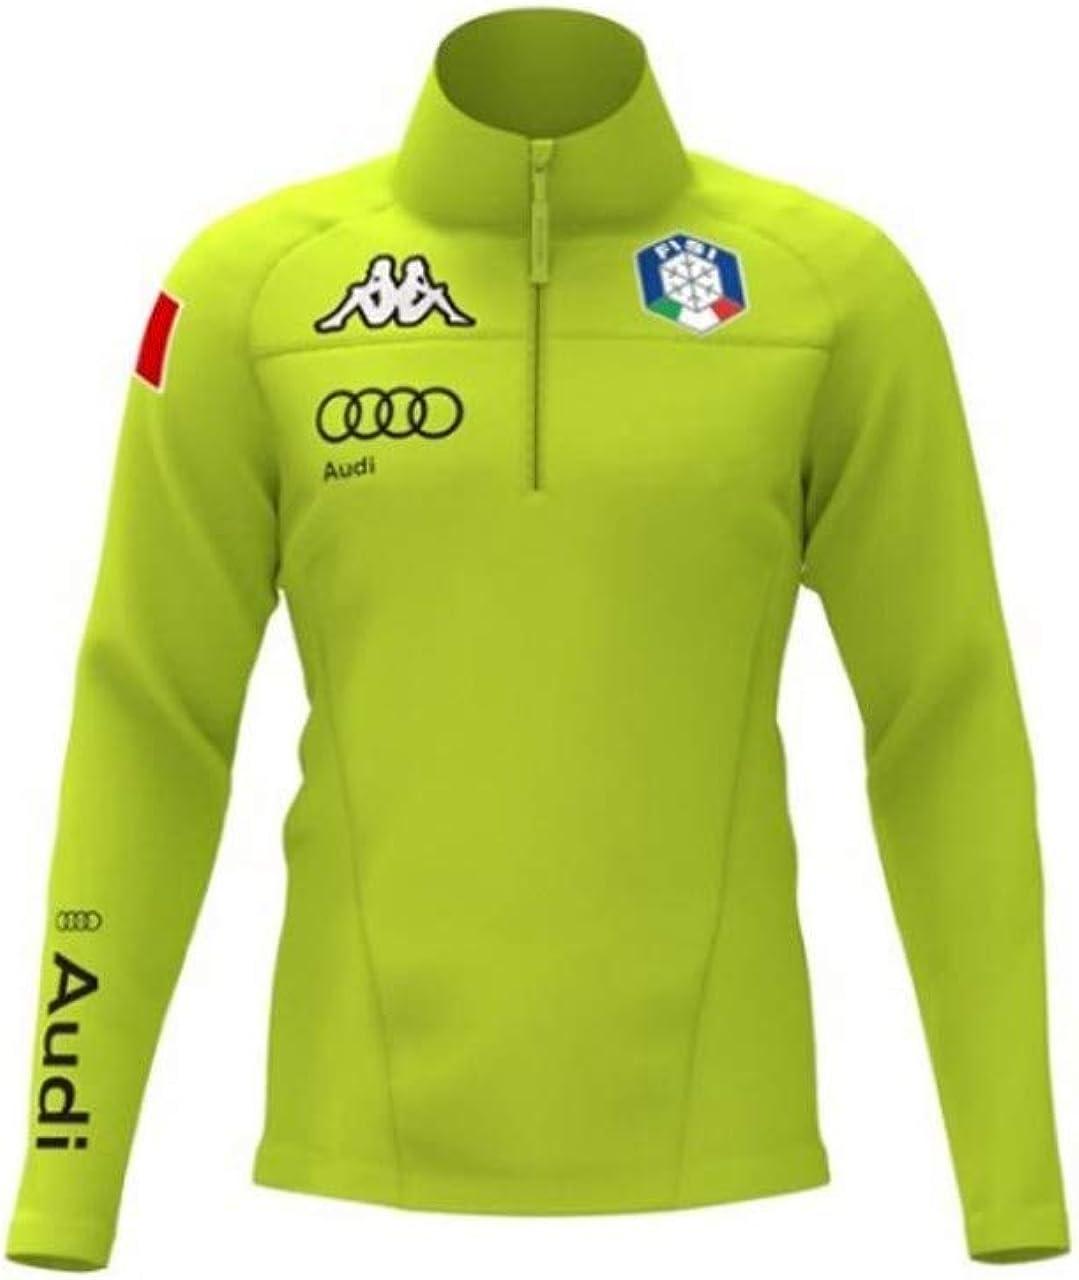 Microfleece Unisex Italian Ski Federation Kappa 6Cento 687B Fisi